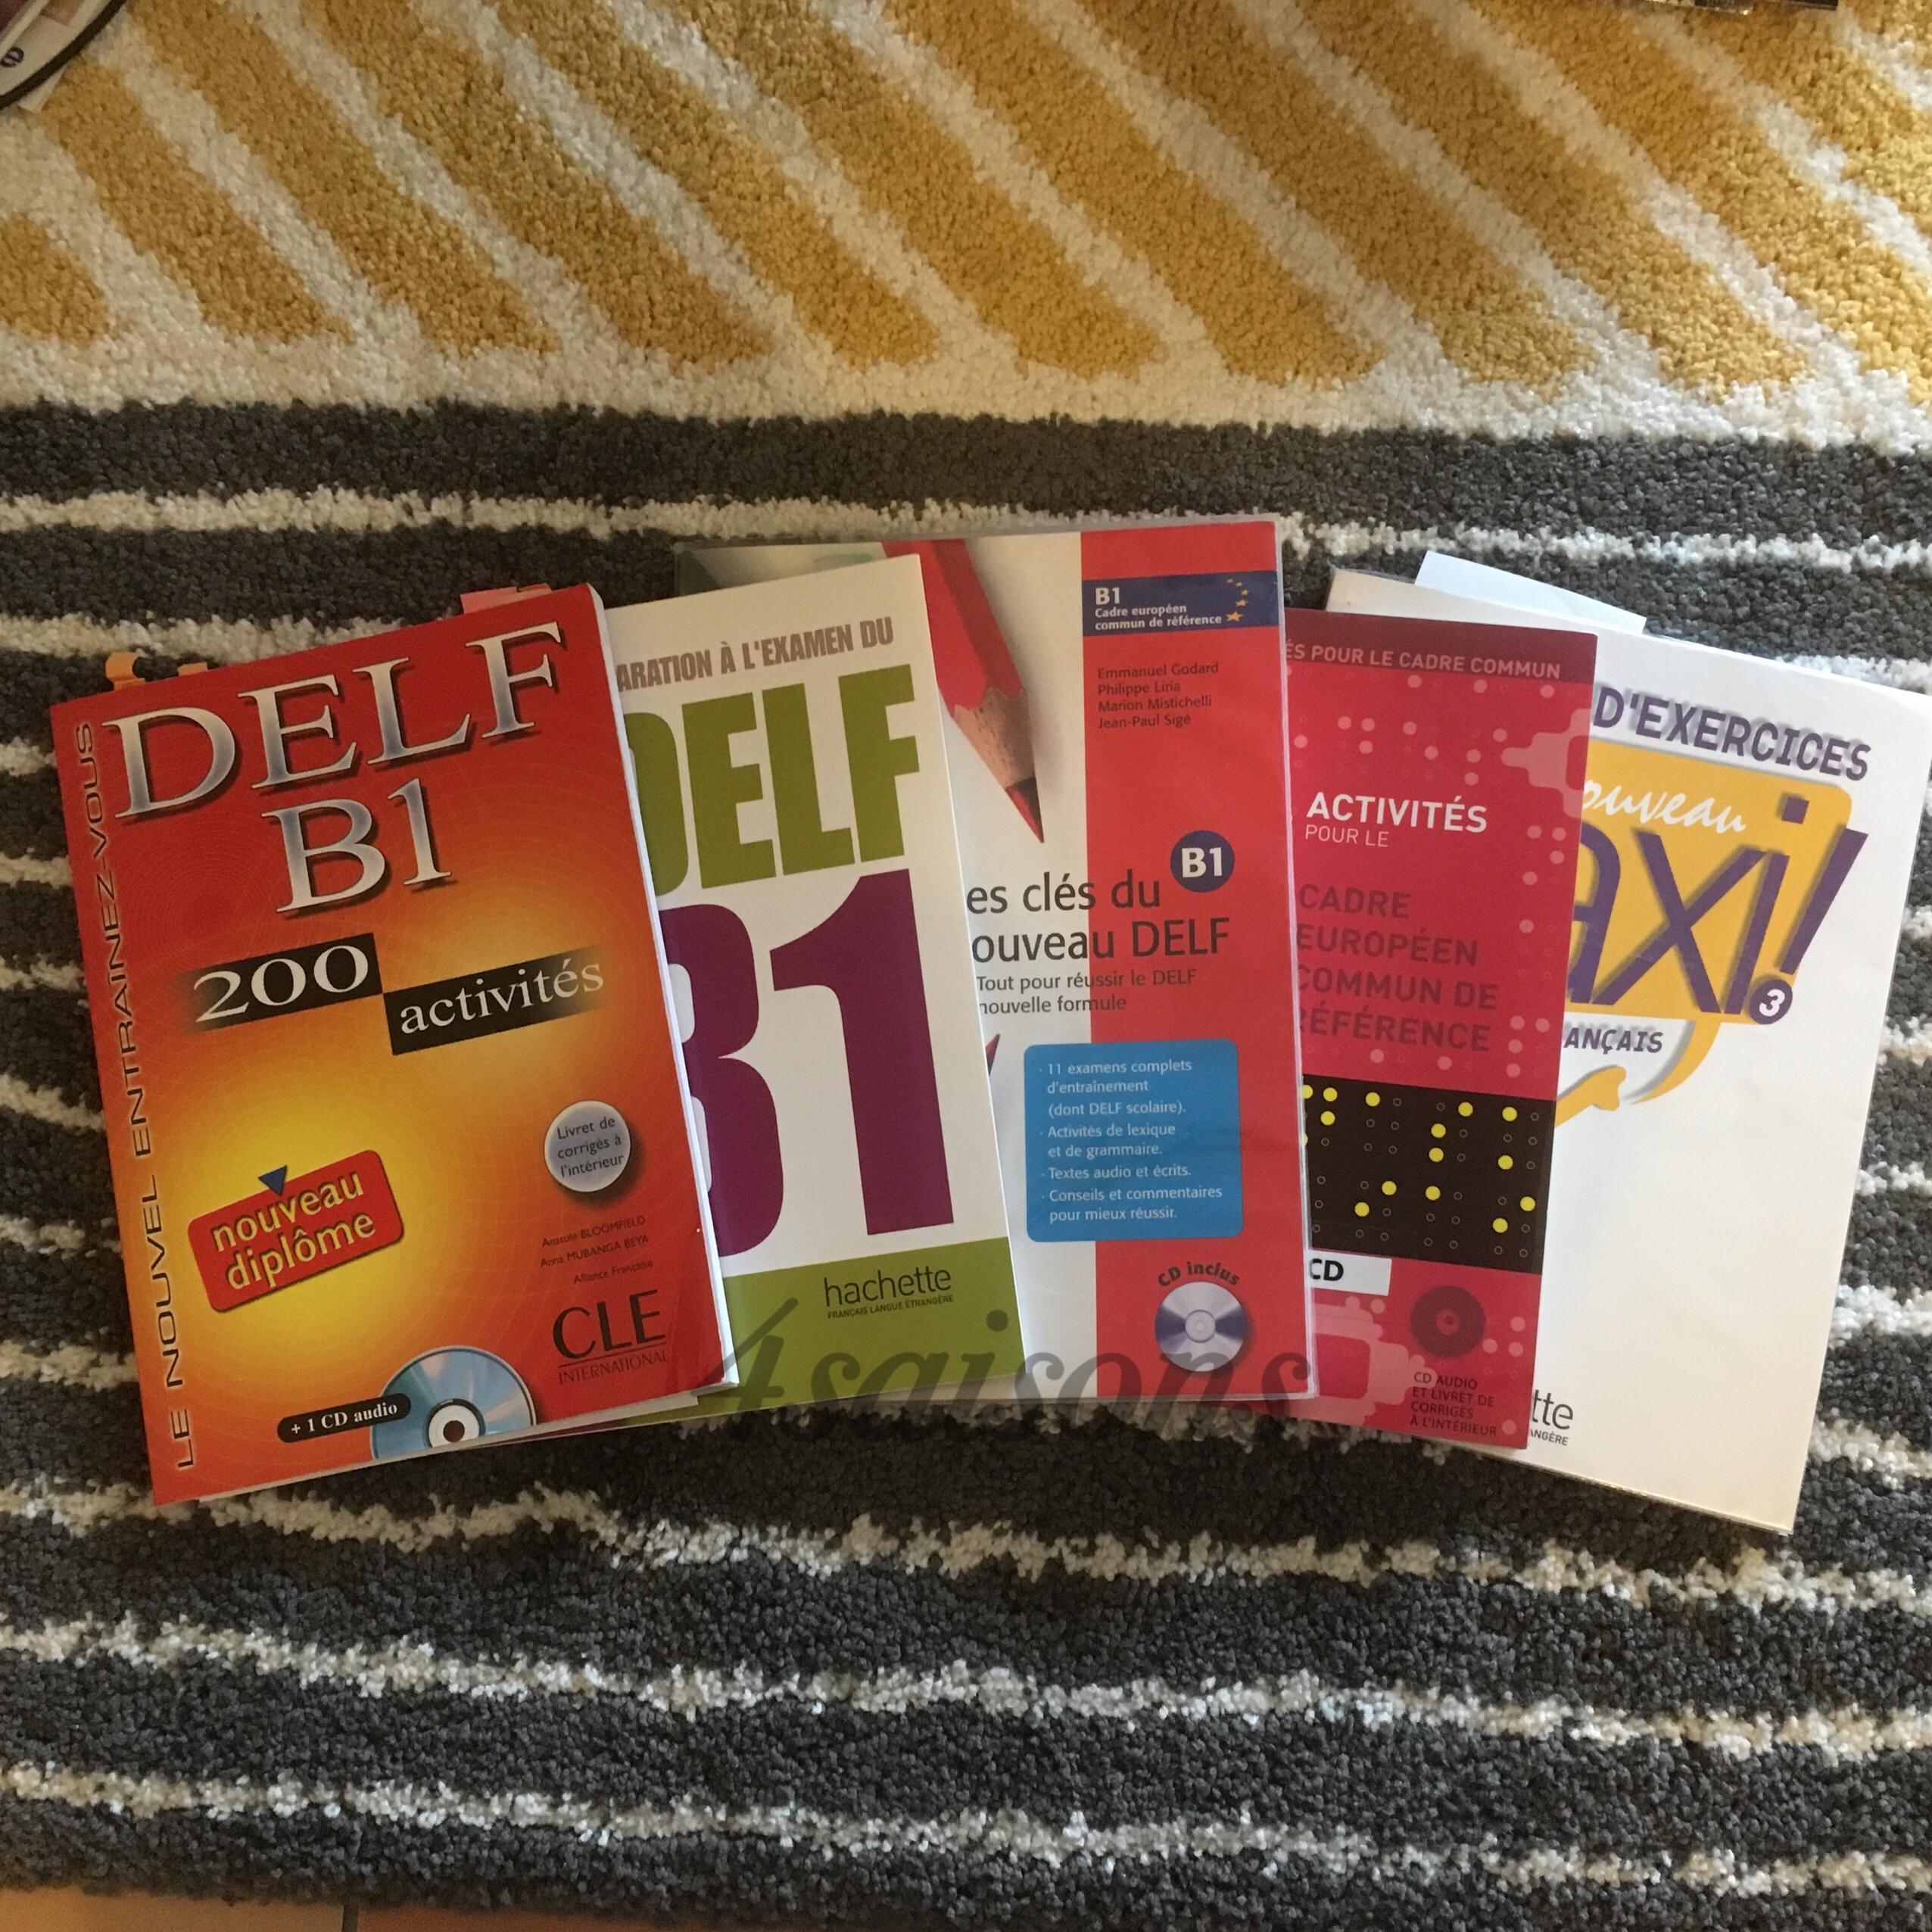 DELFB1勉強方法おすすめのテキスト